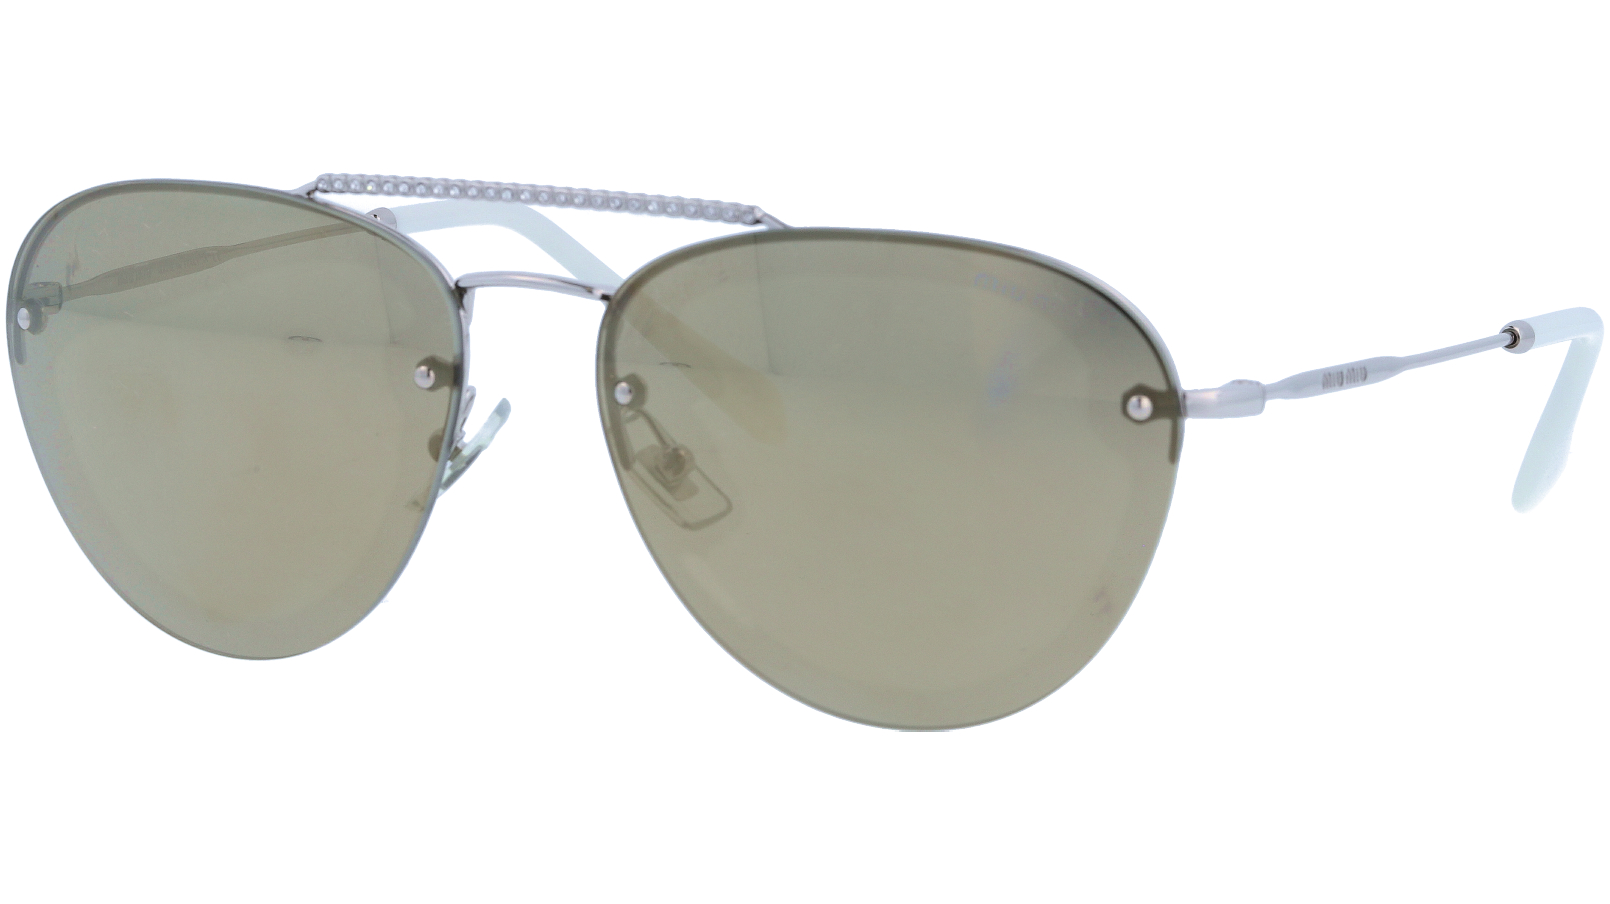 Miu Miu MU54US 1BC1C0 59 Gold Sunglasses